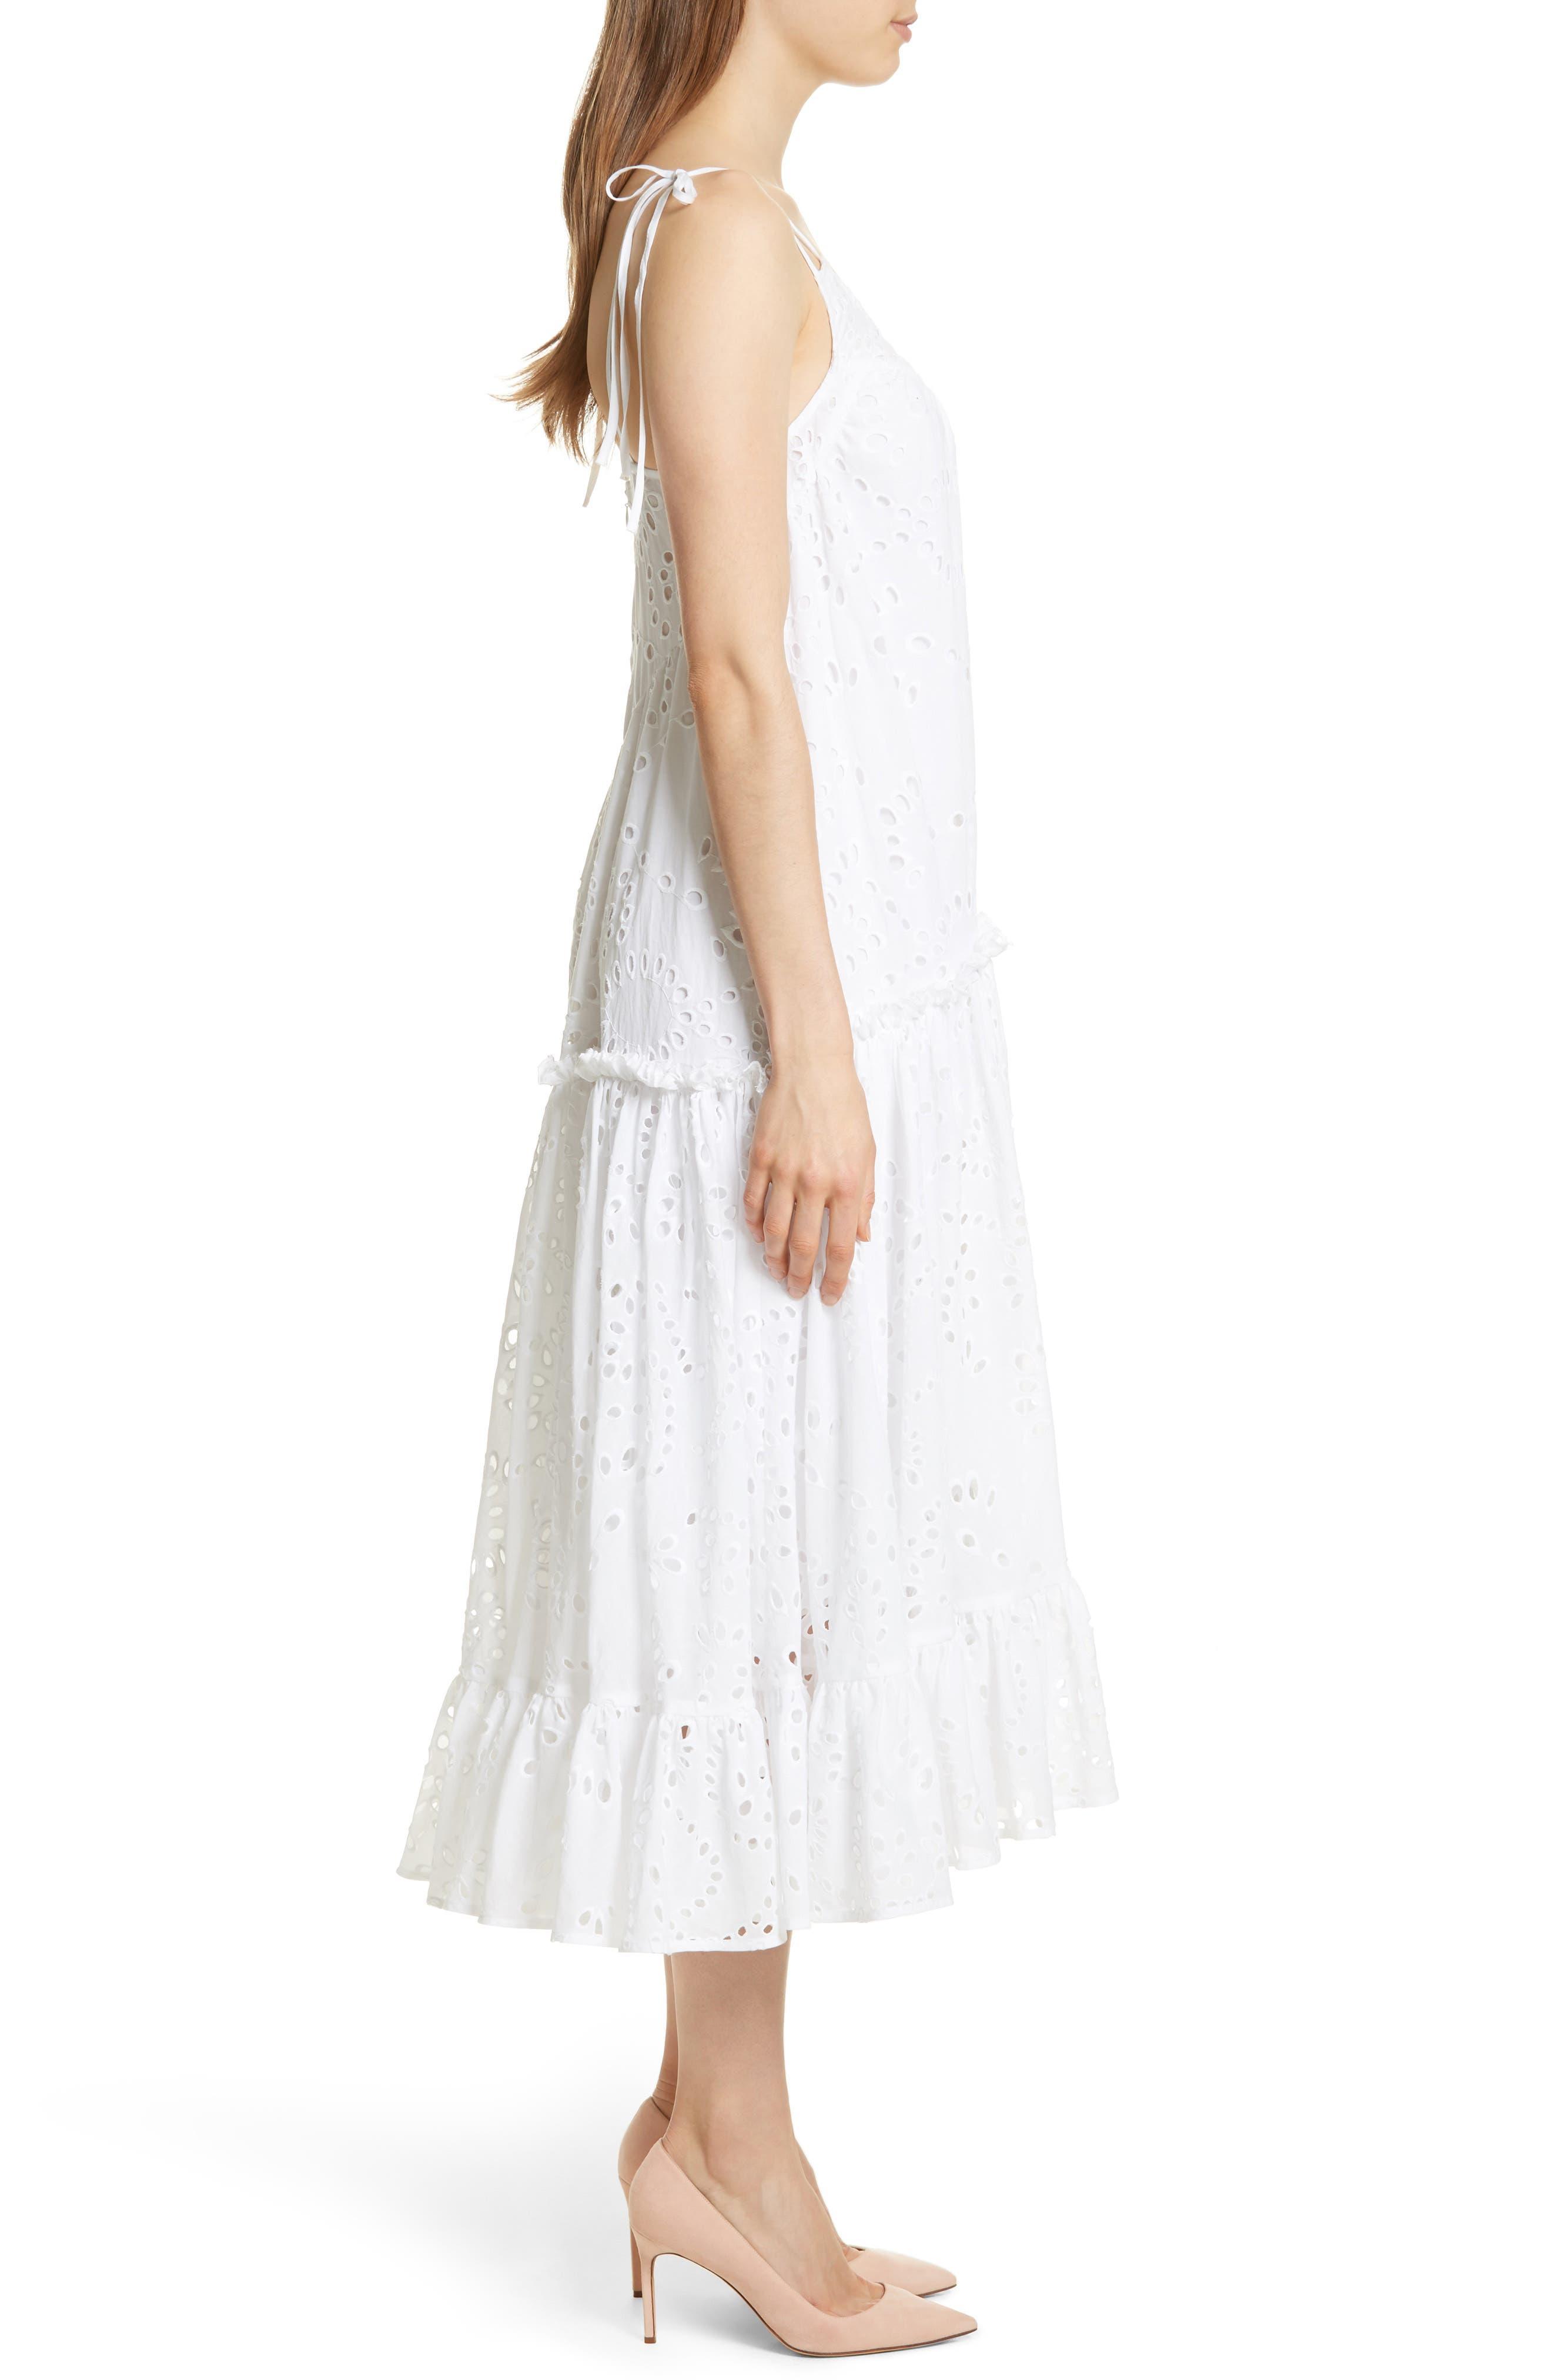 Prose & Poetry Kerr Eyelet Peasant Midi Dress,                             Alternate thumbnail 3, color,                             Cloud White